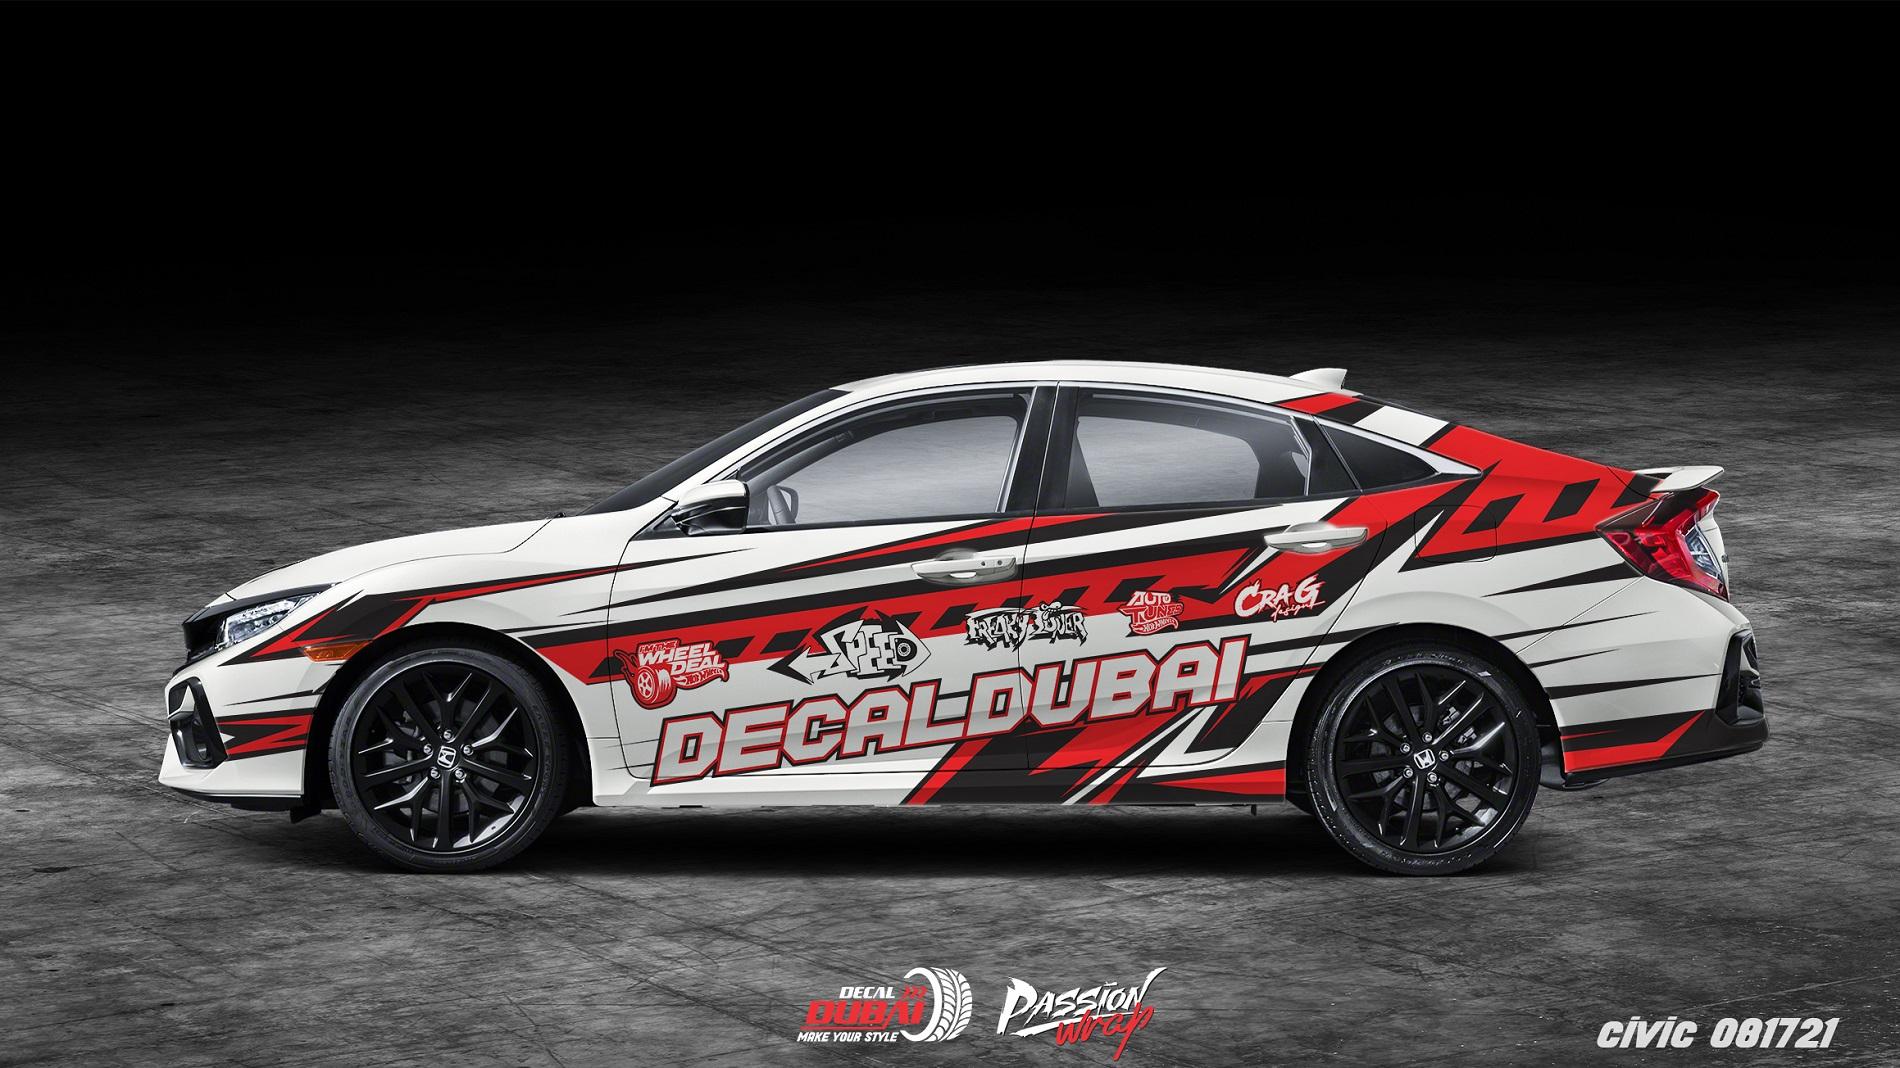 decal-Honda-Civic-081721-1750k